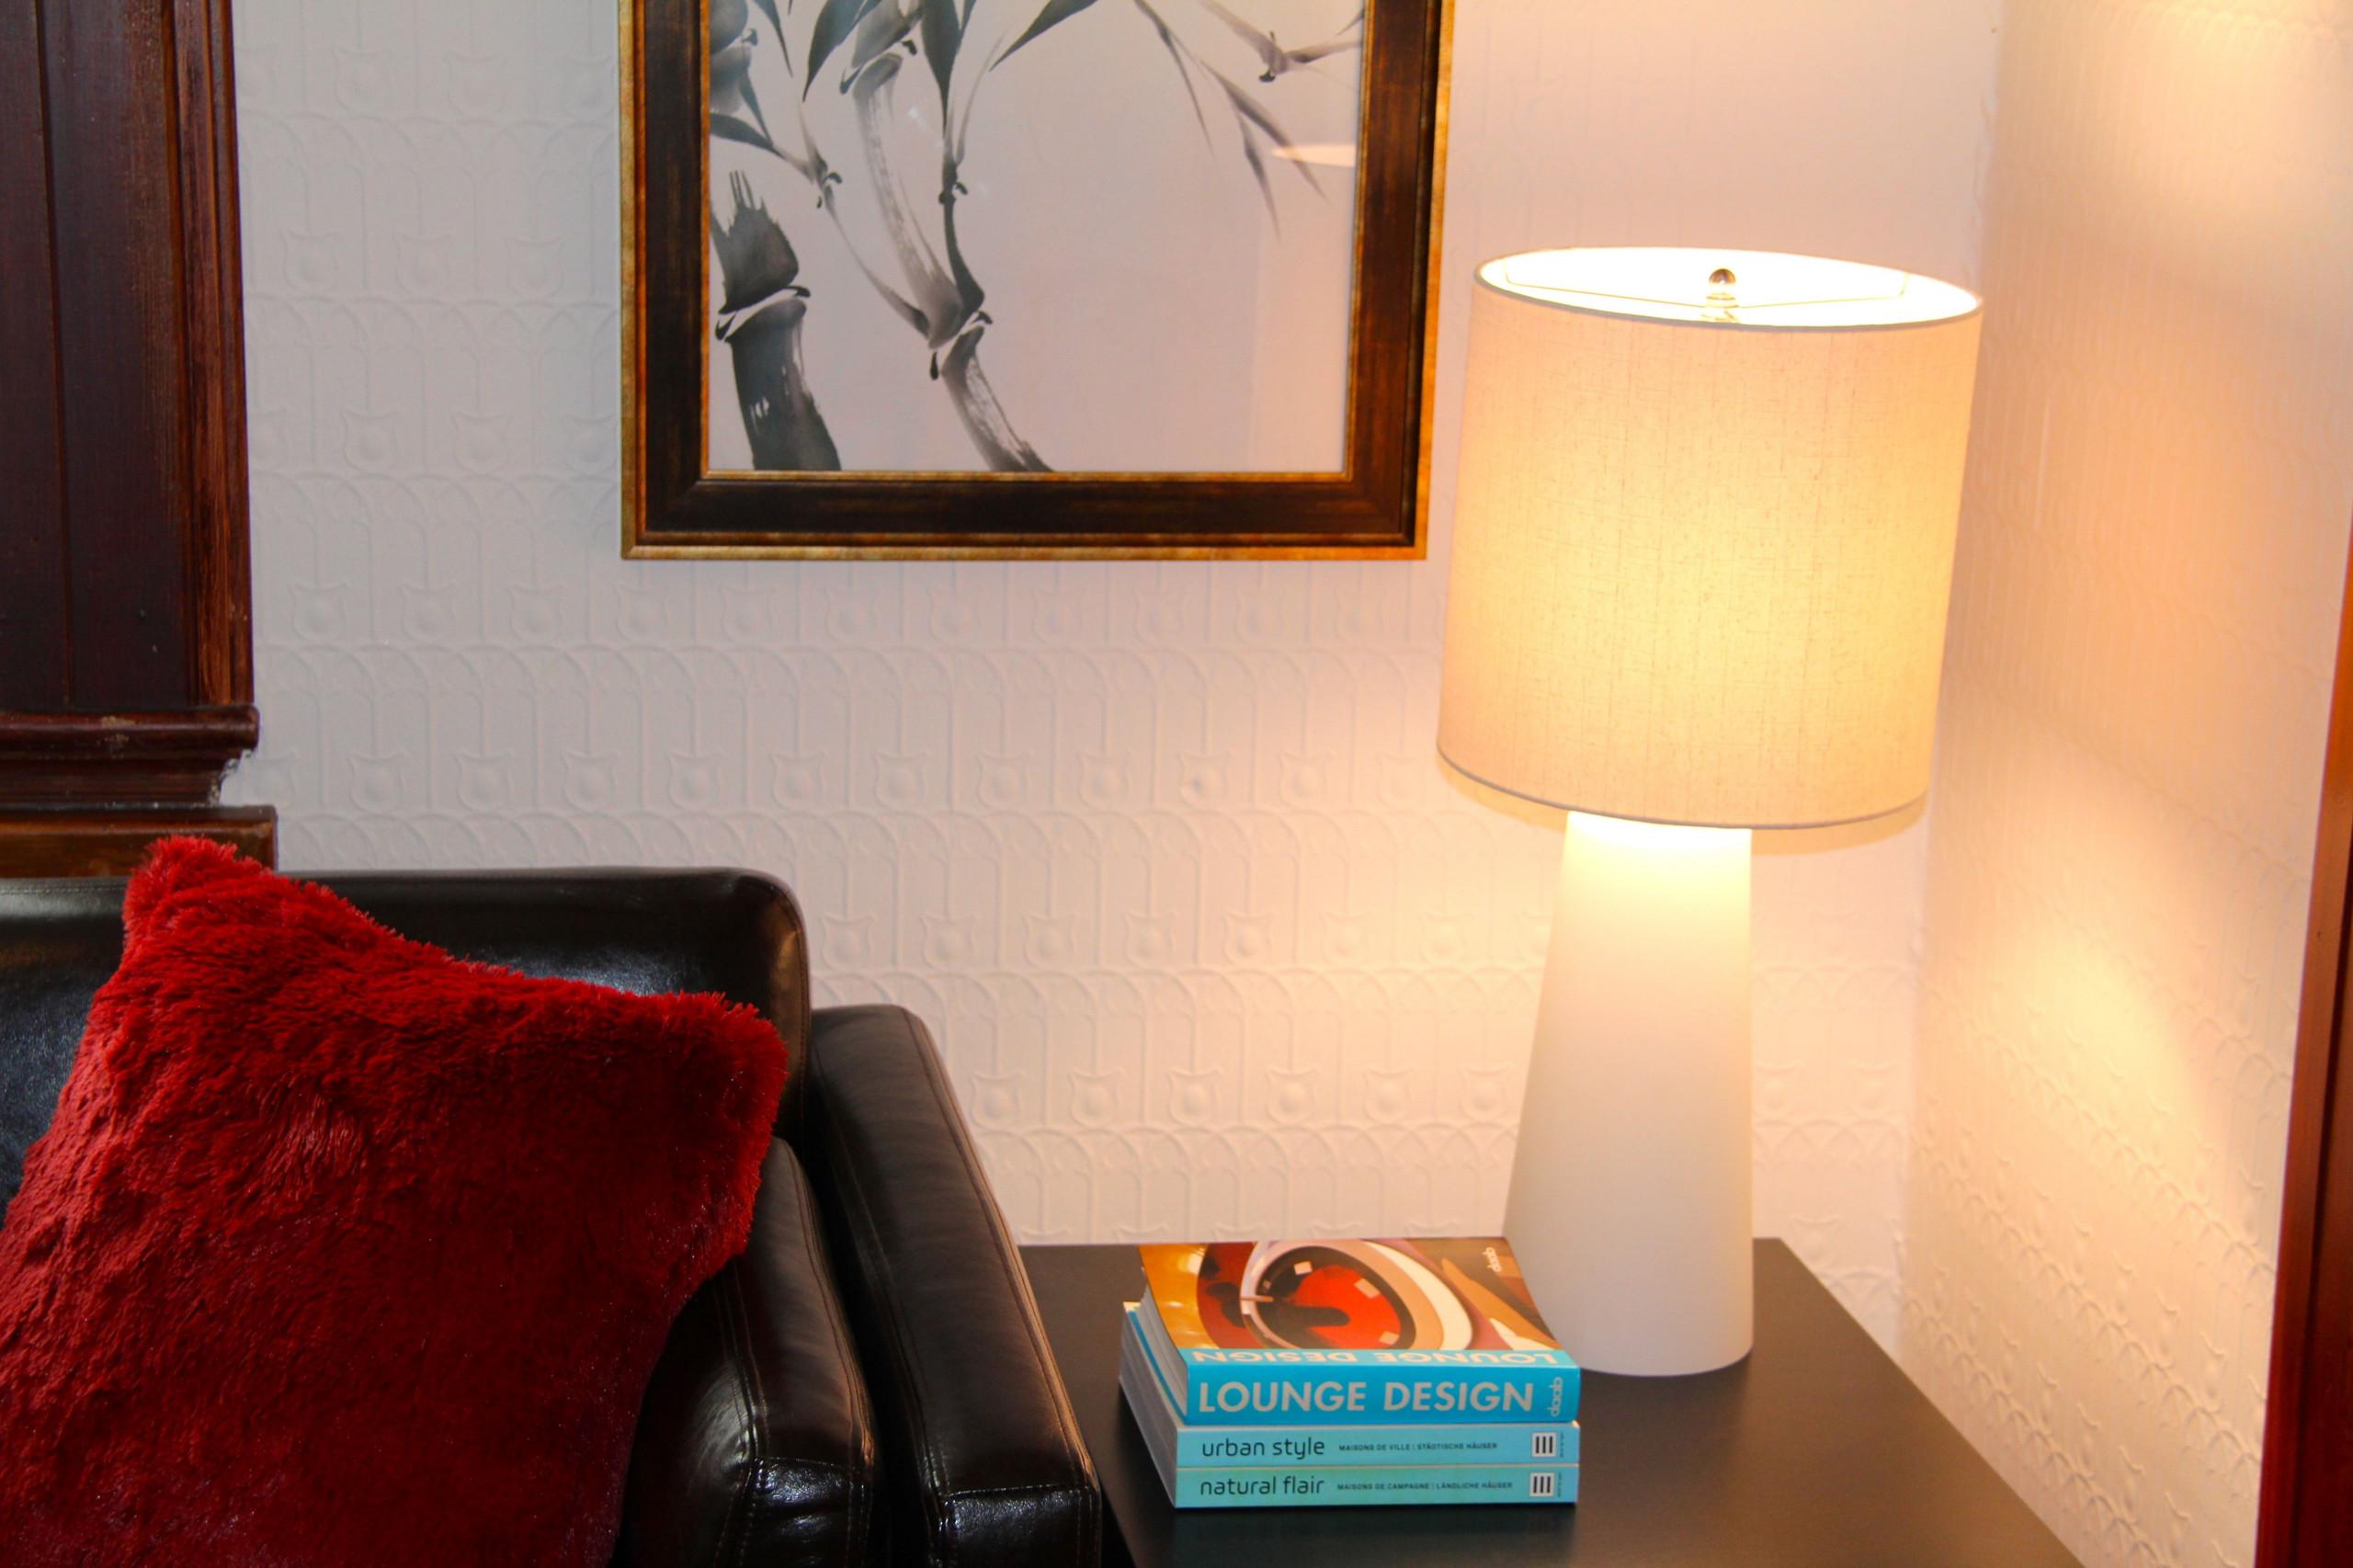 Le Plateau Condo - Home Staging Project